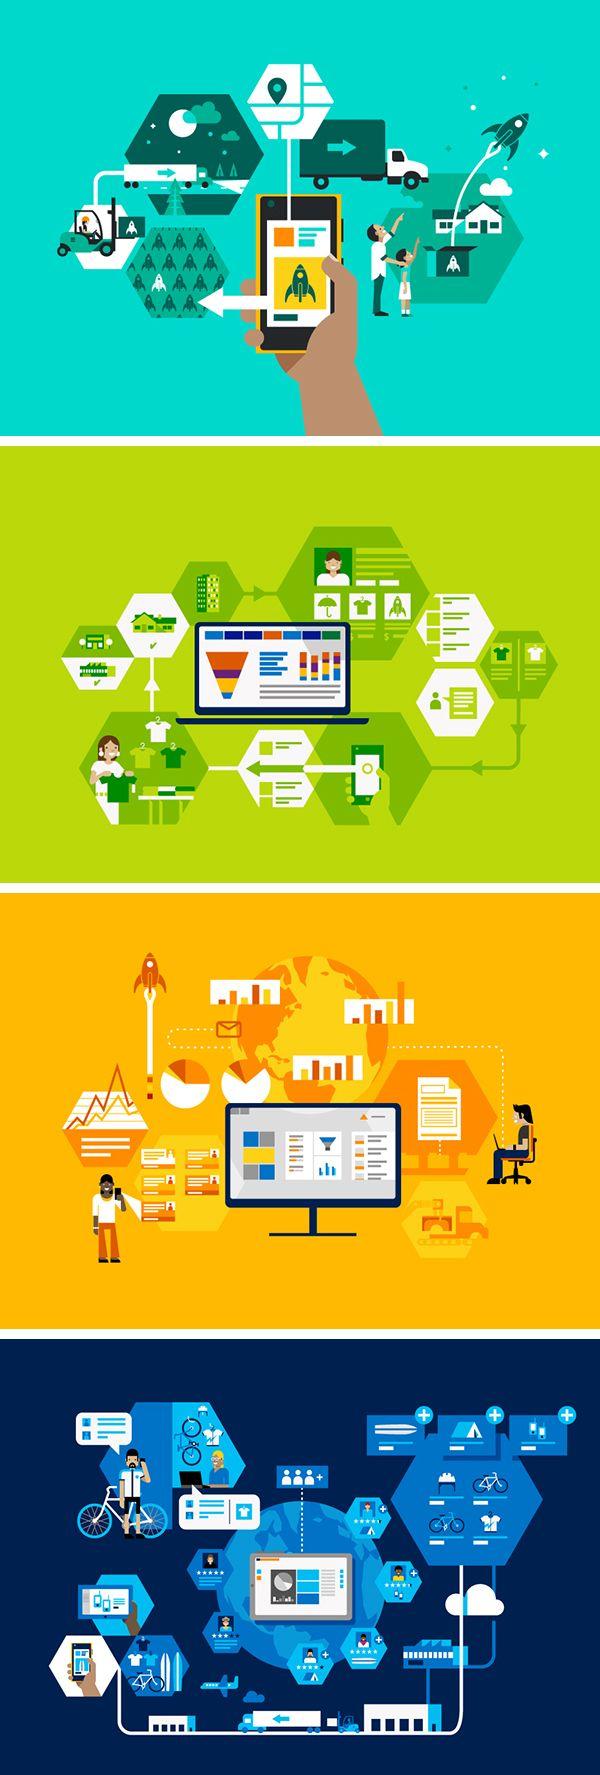 Microsoft Dynamics Illustrations Desain grafis, Desain